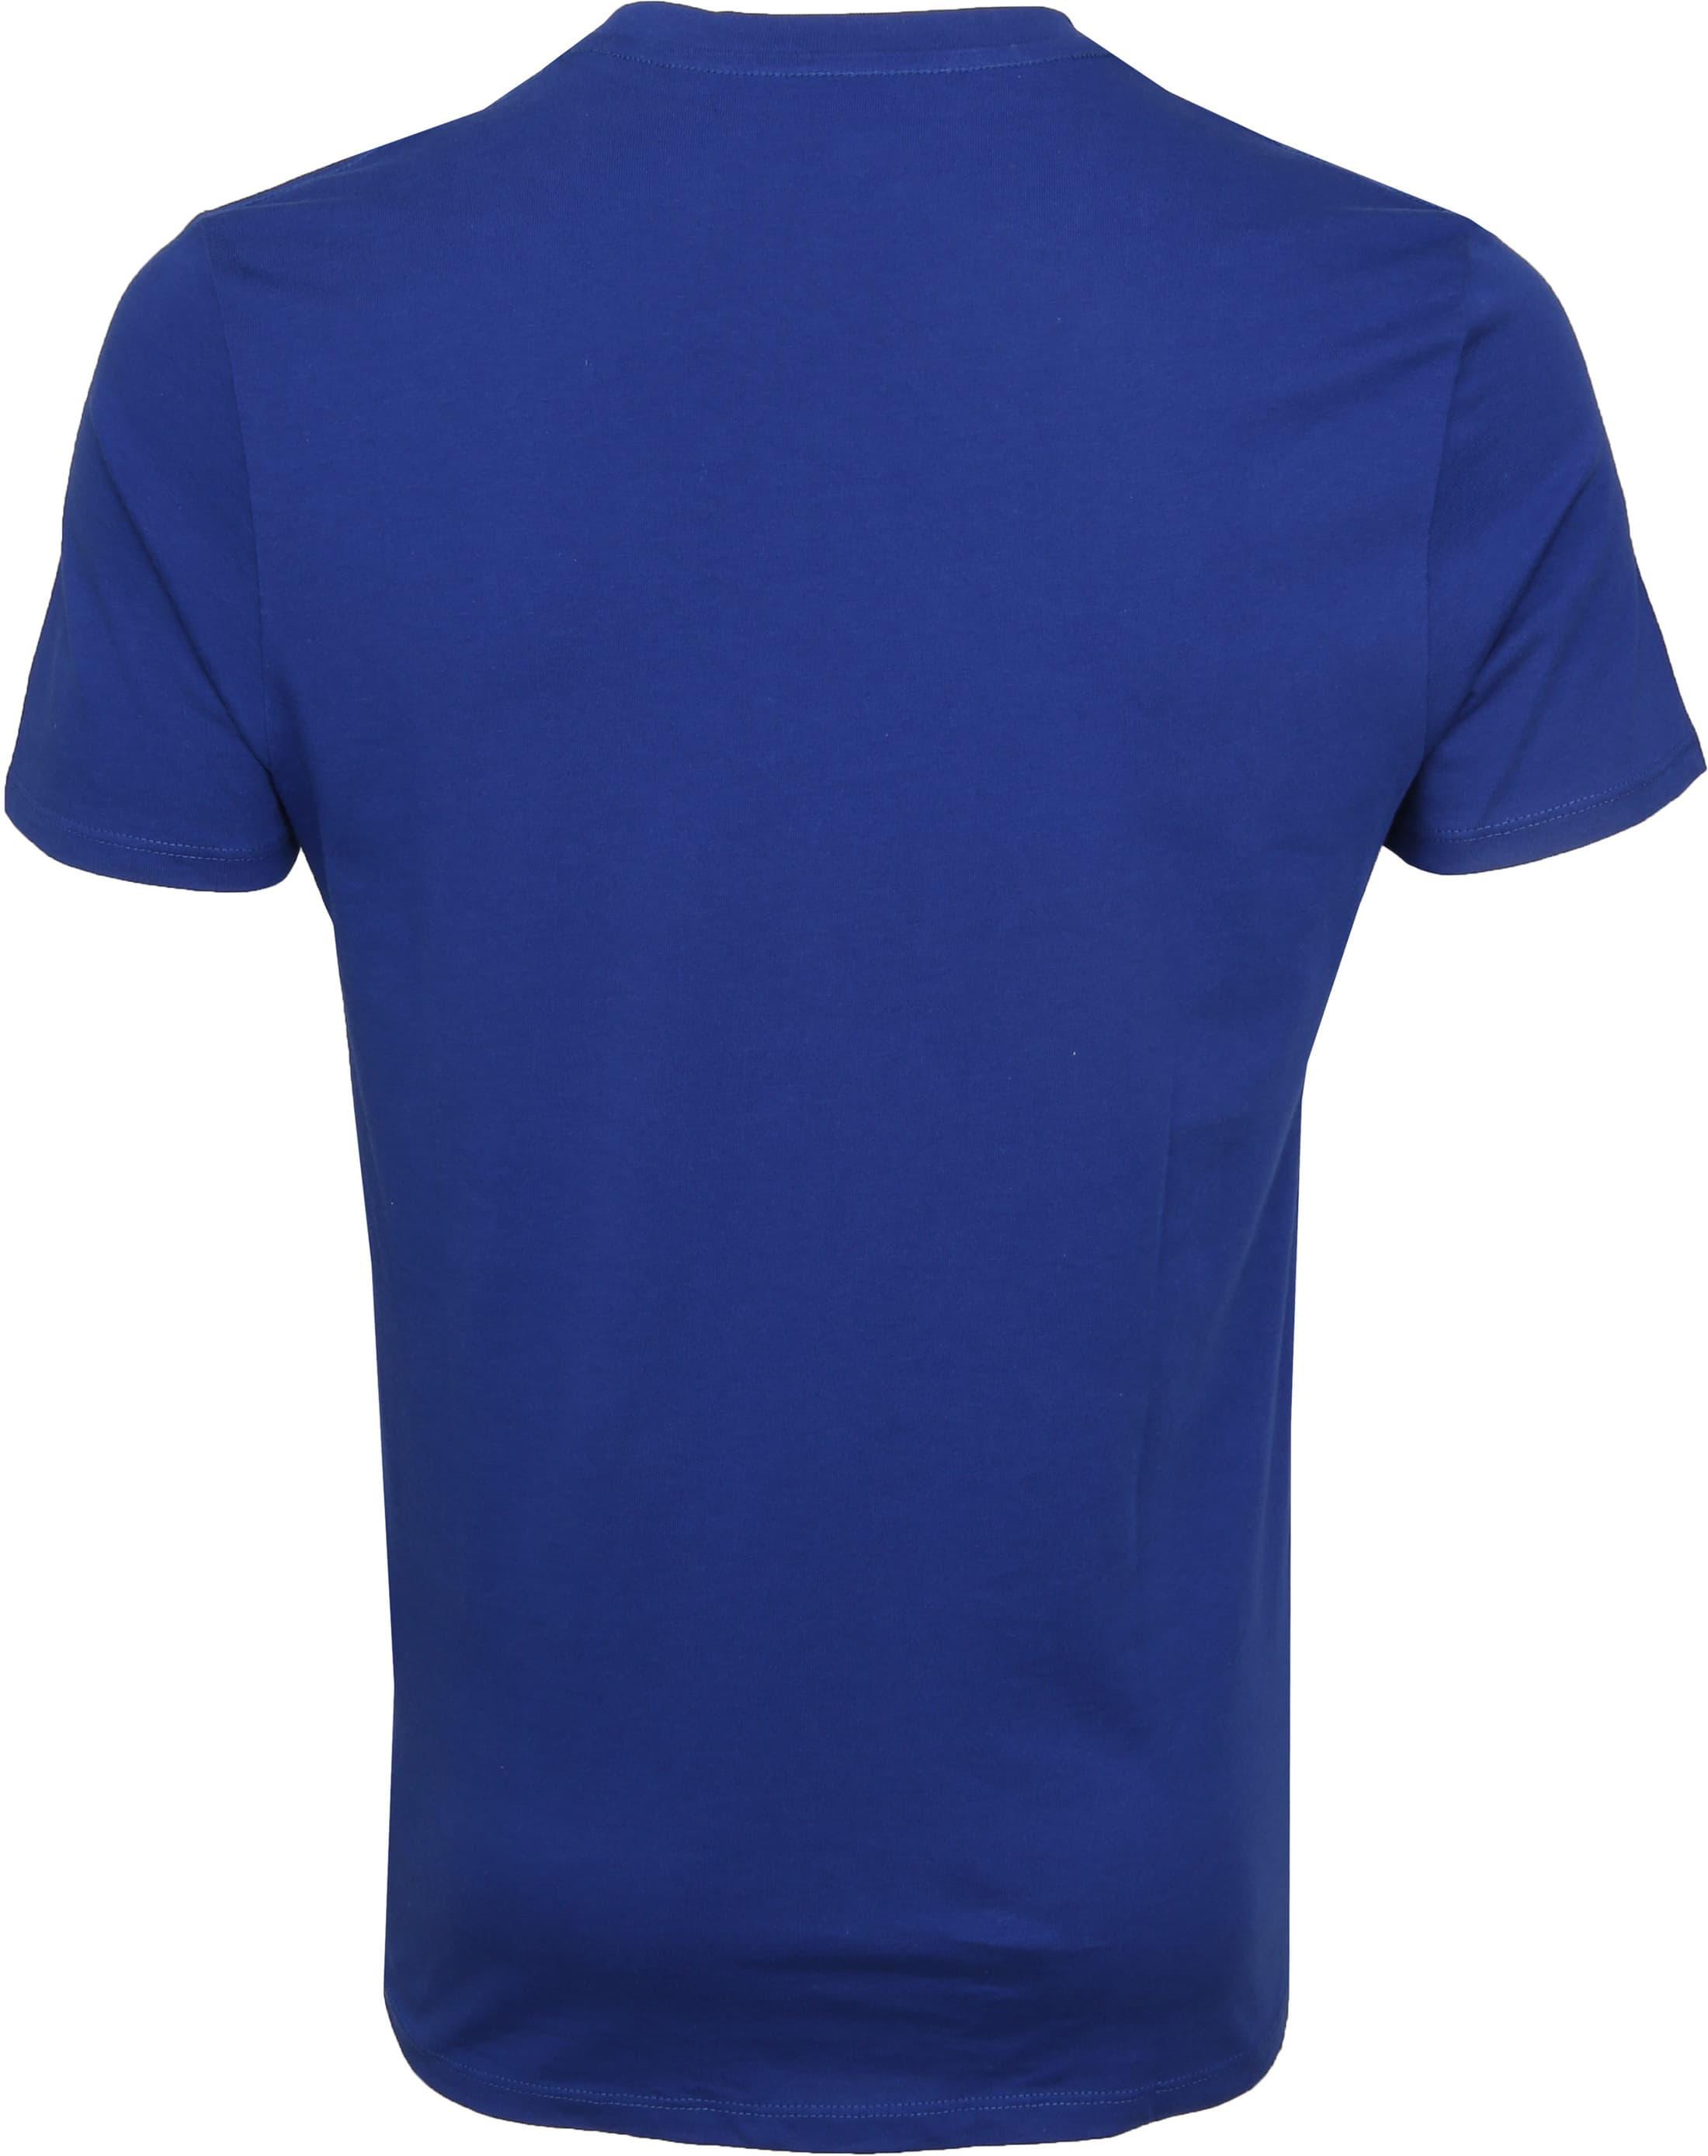 Levi's T-shirt Boxtab Blauw foto 2